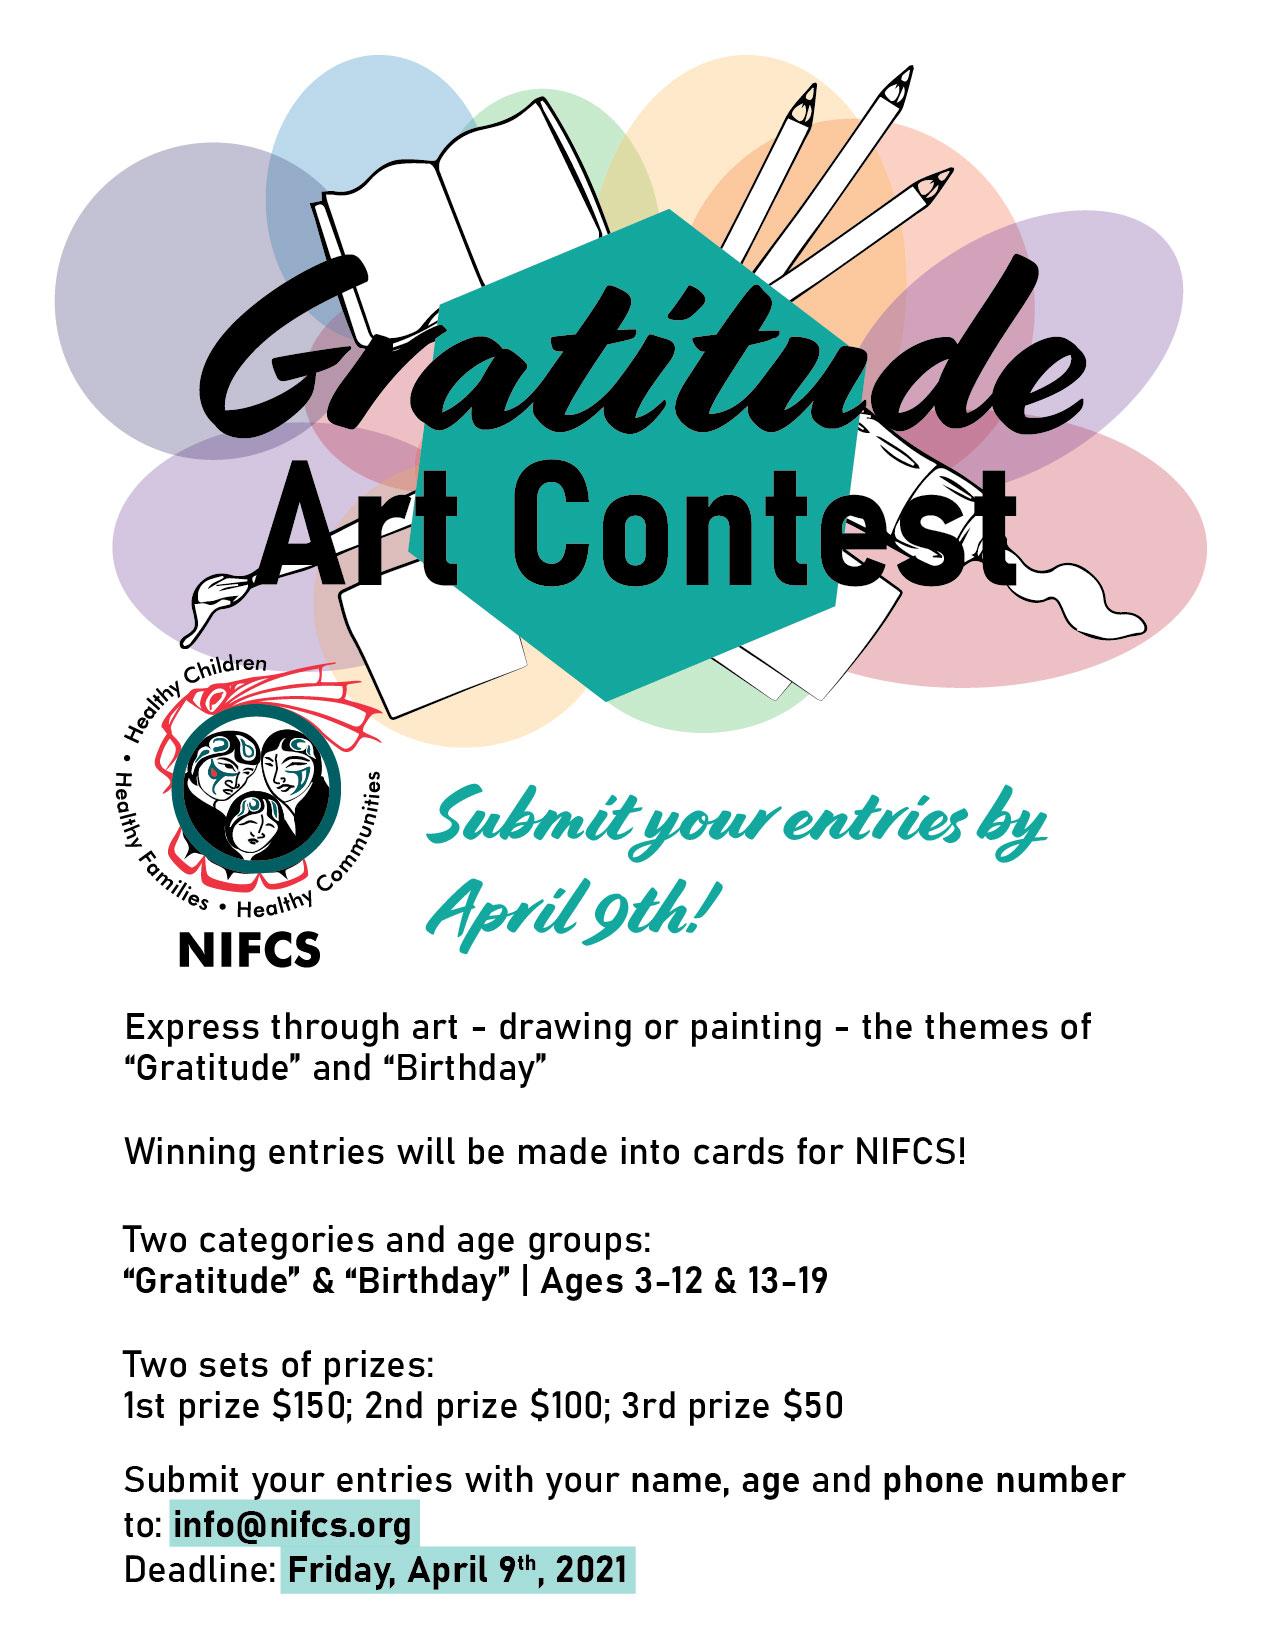 Attitude of Gratitude Art Contest with NIFCS